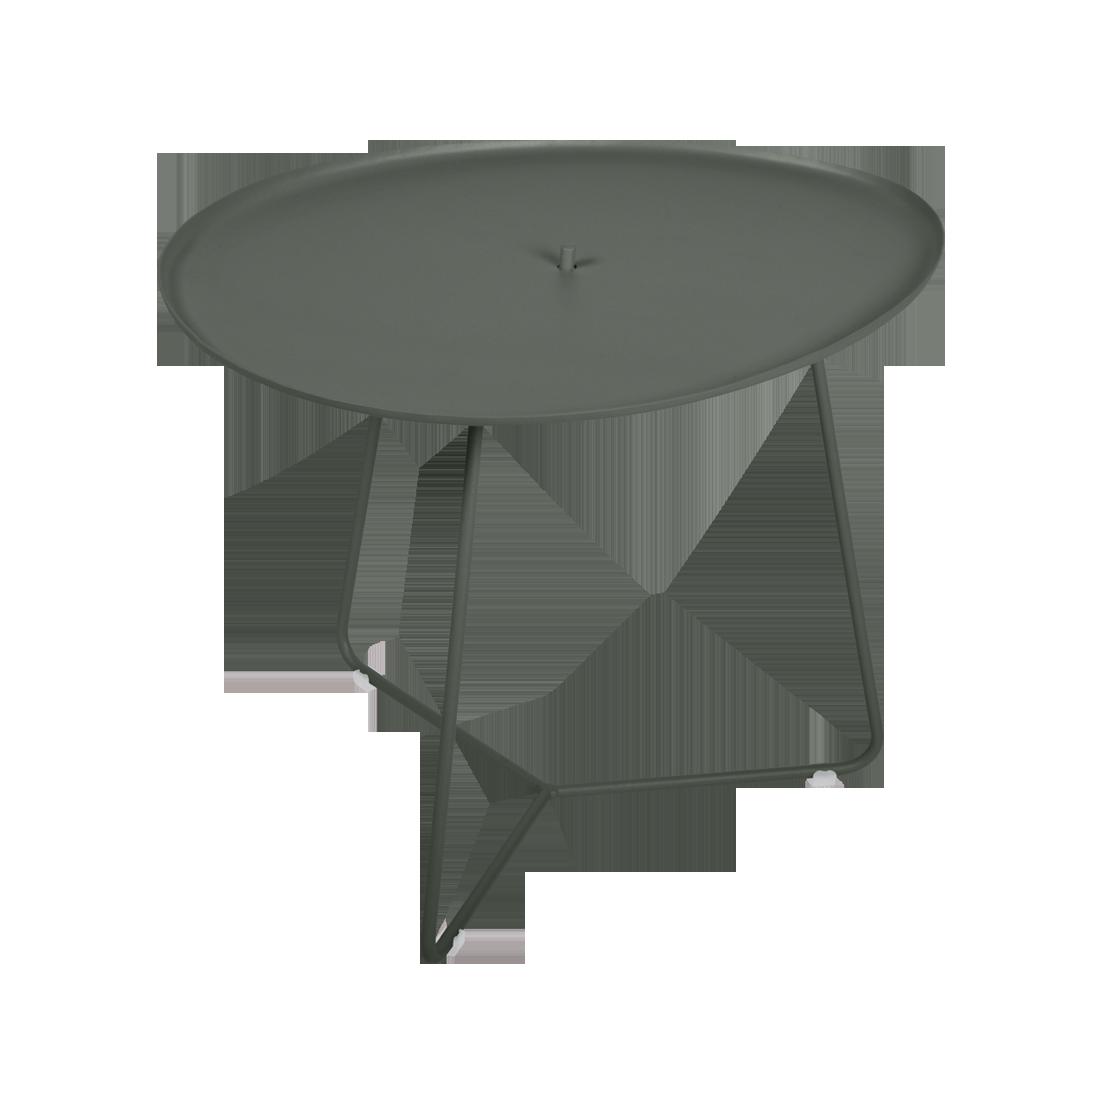 table basse metal, table basse fermob, table basse de jardin, table basse vert